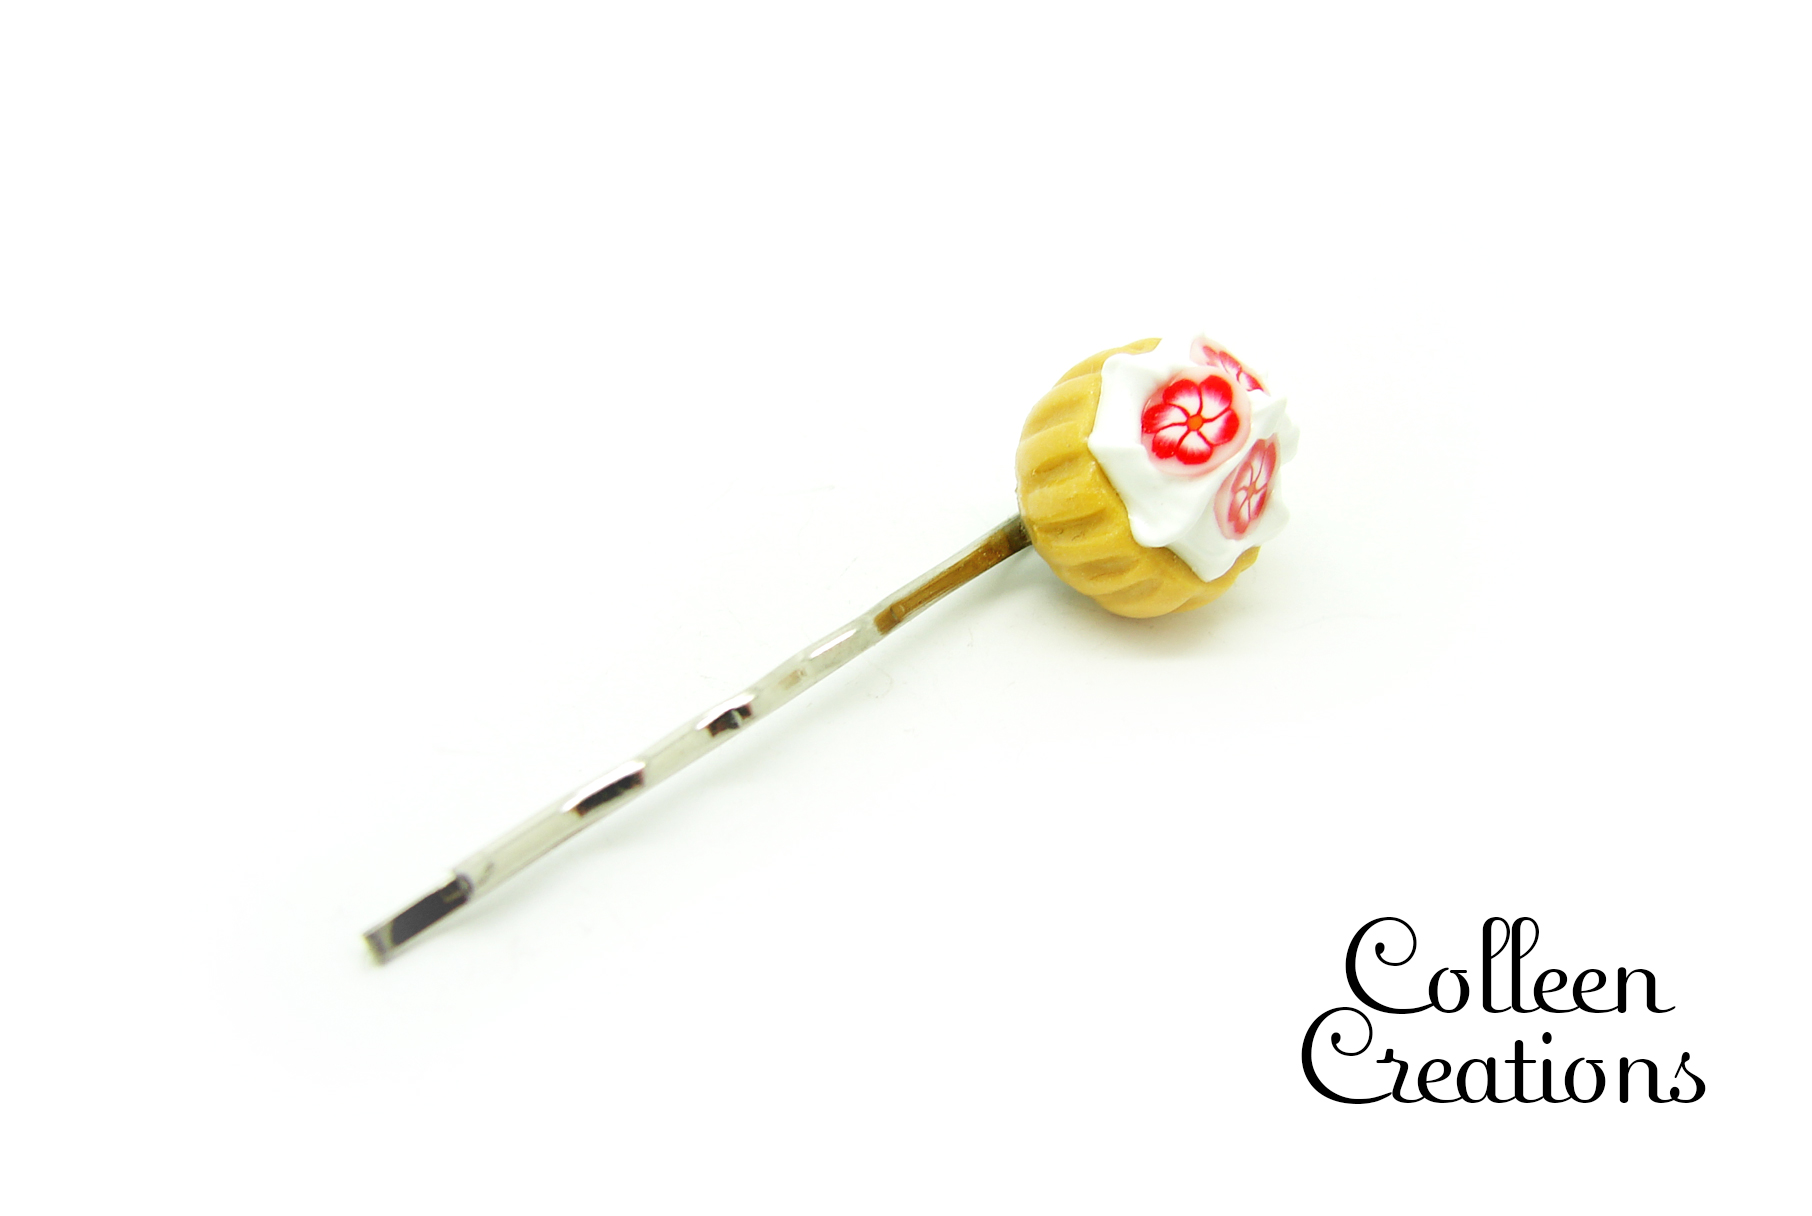 barrette-pince-cupcake-marron-fleurs-roses-2